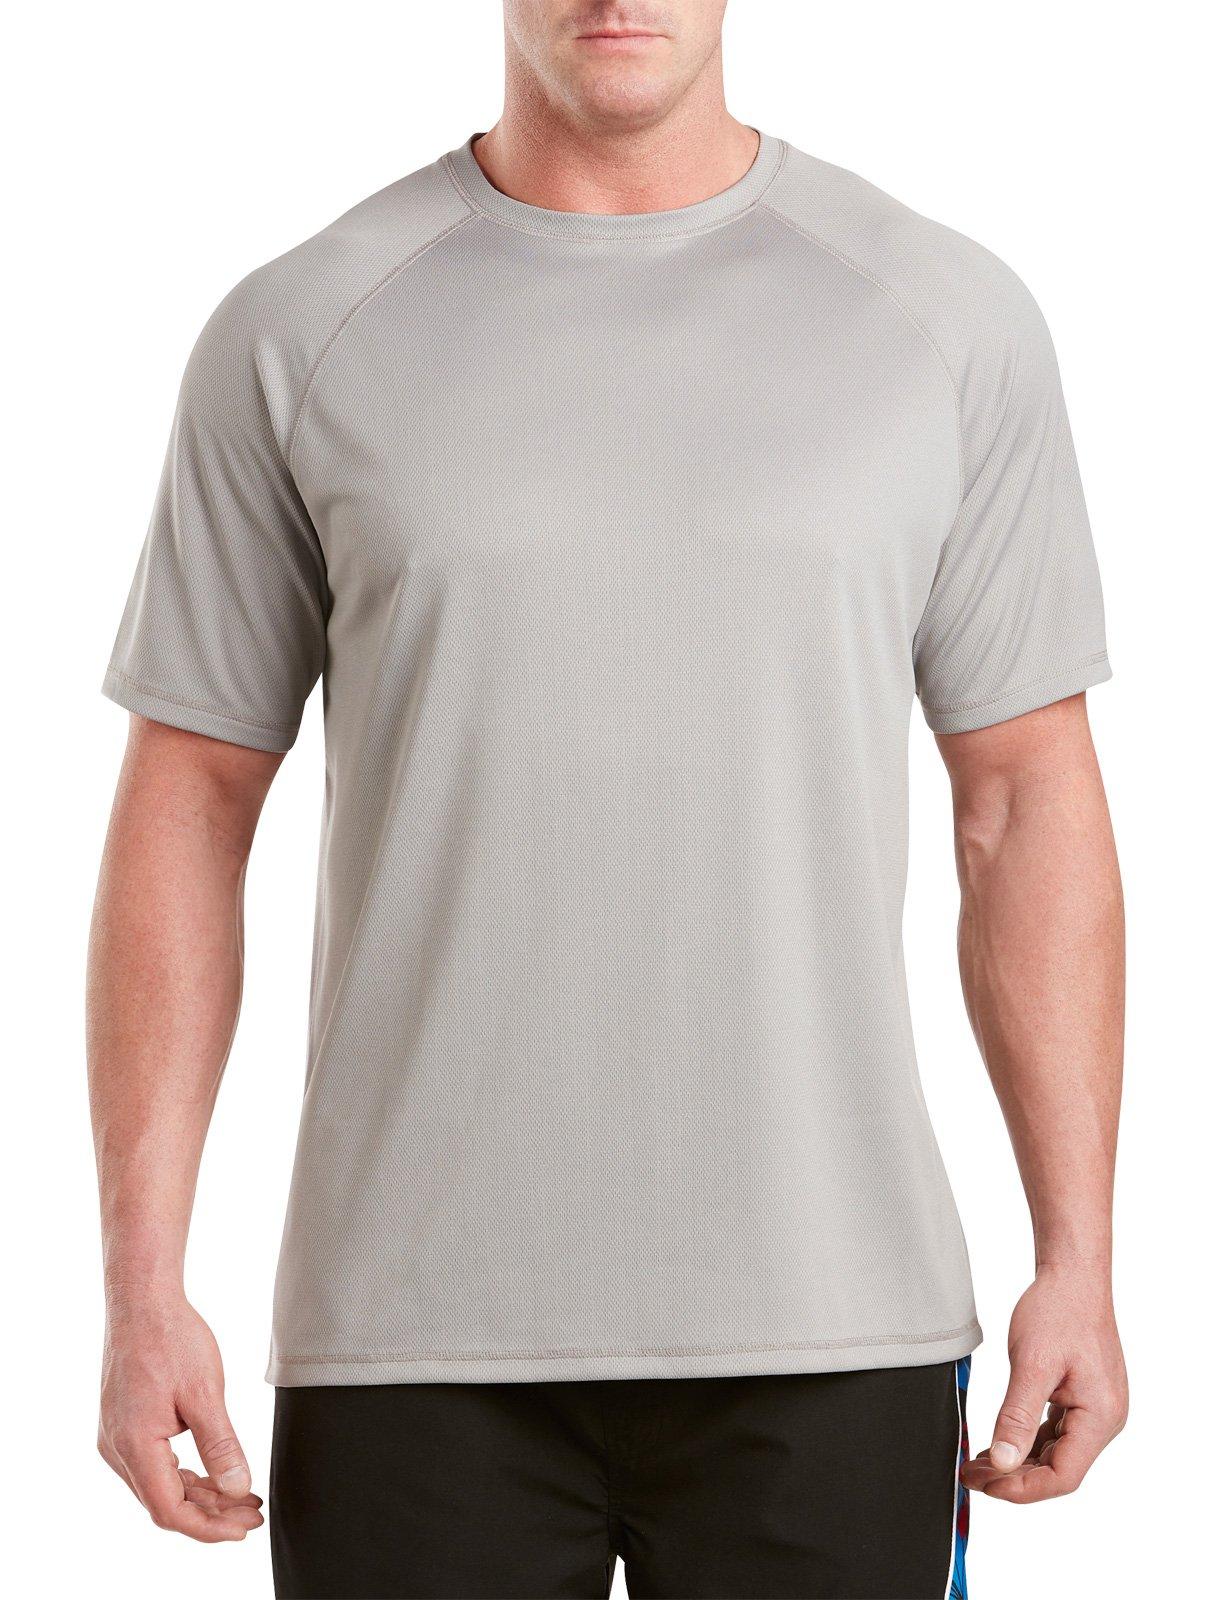 Harbor Bay by DXL Big and Tall Swim Rash Guard T-Shirt, Grey 5XLTall by Harbor Bay